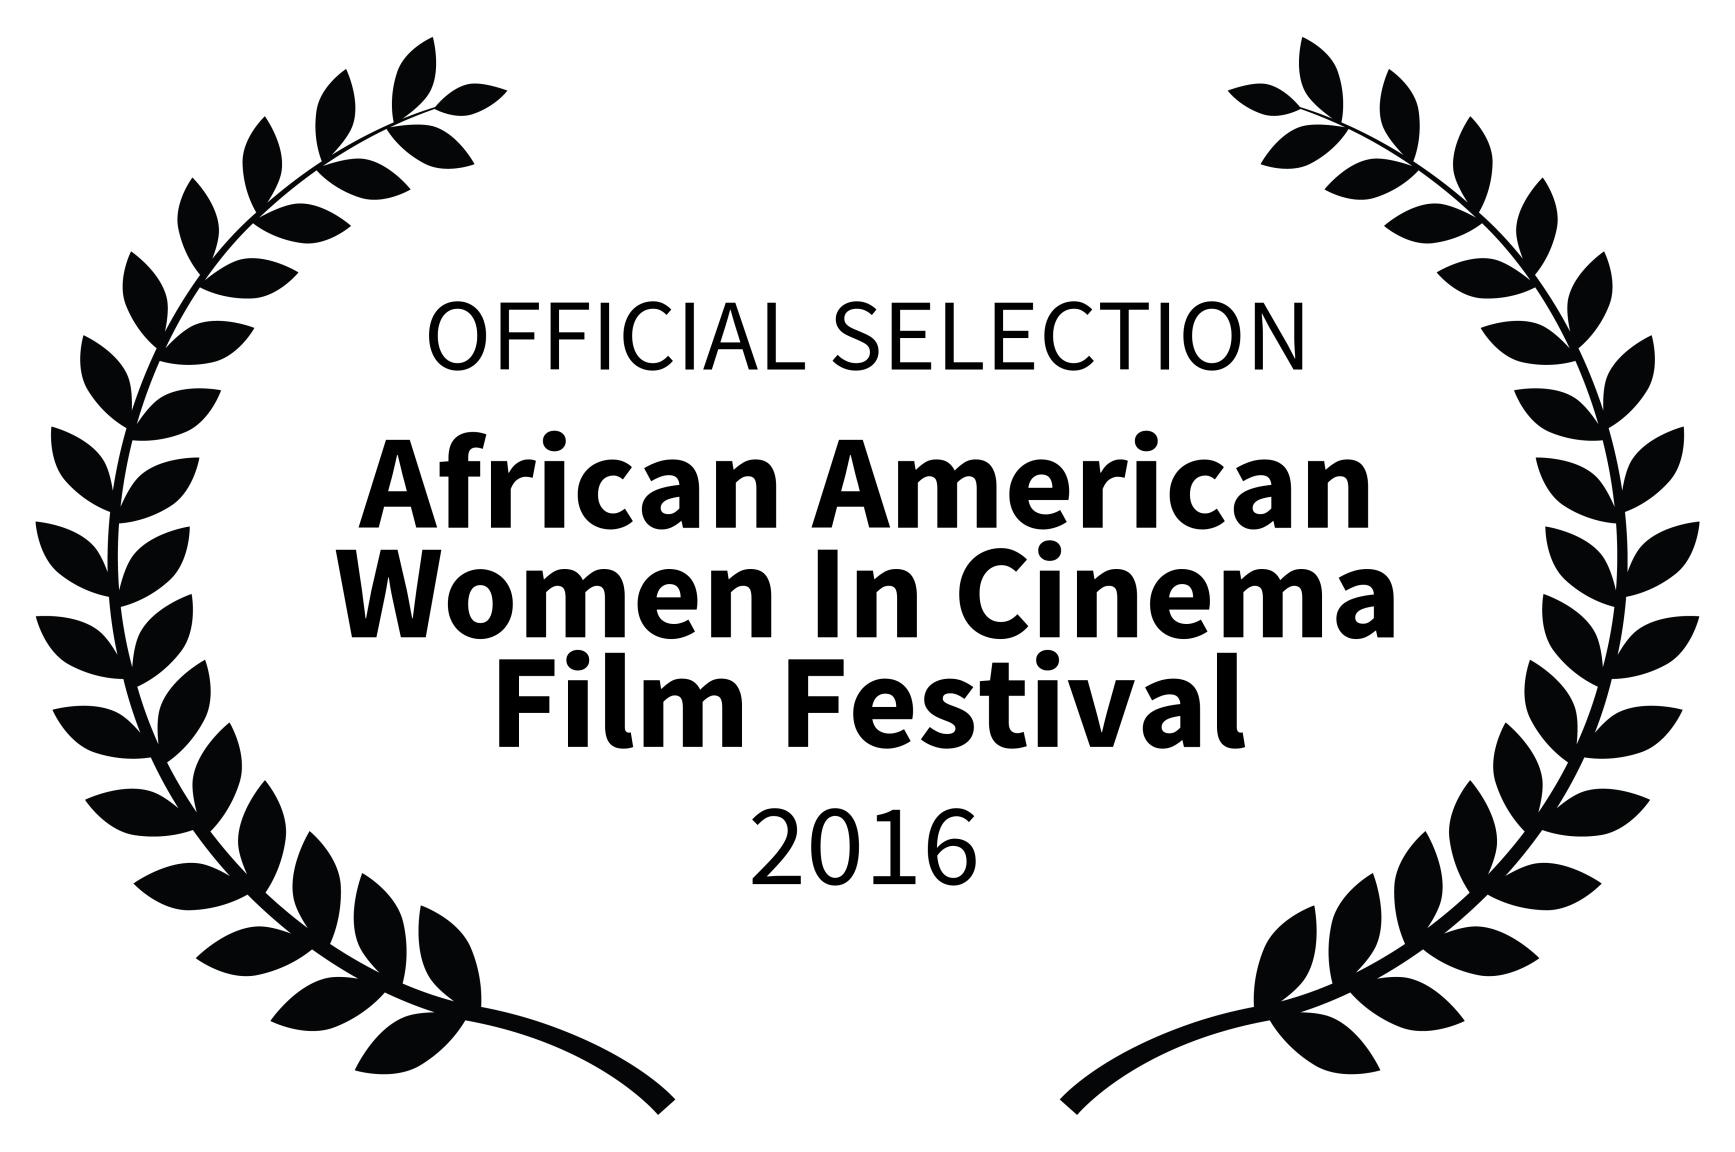 African American Women In Cinema Film Festival 2016.jpg